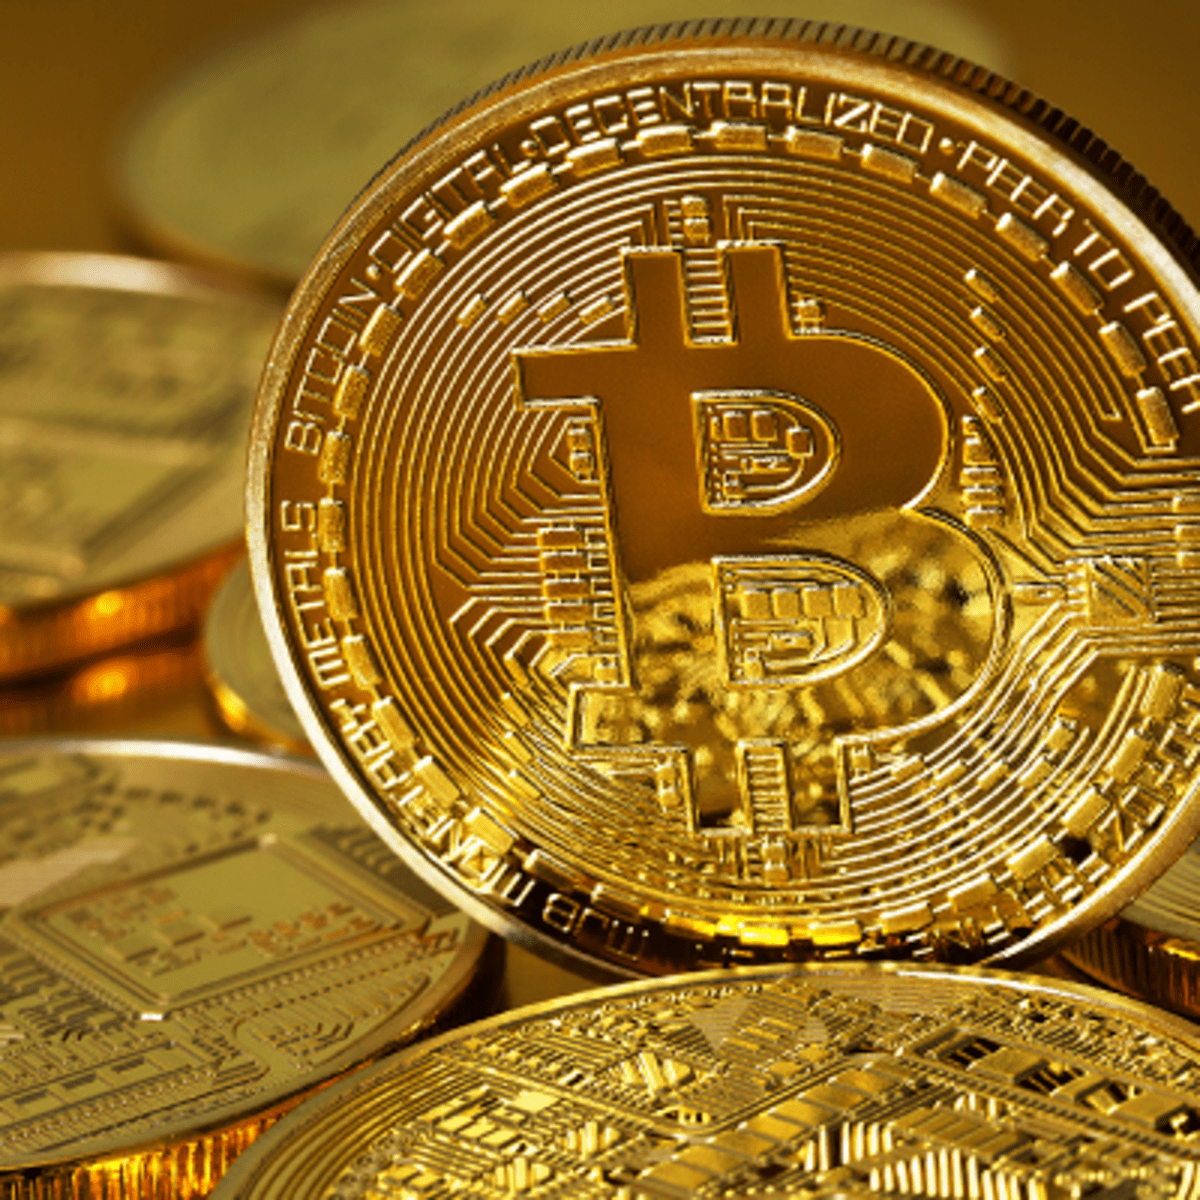 up formular btc 2021 rollin bitcoin